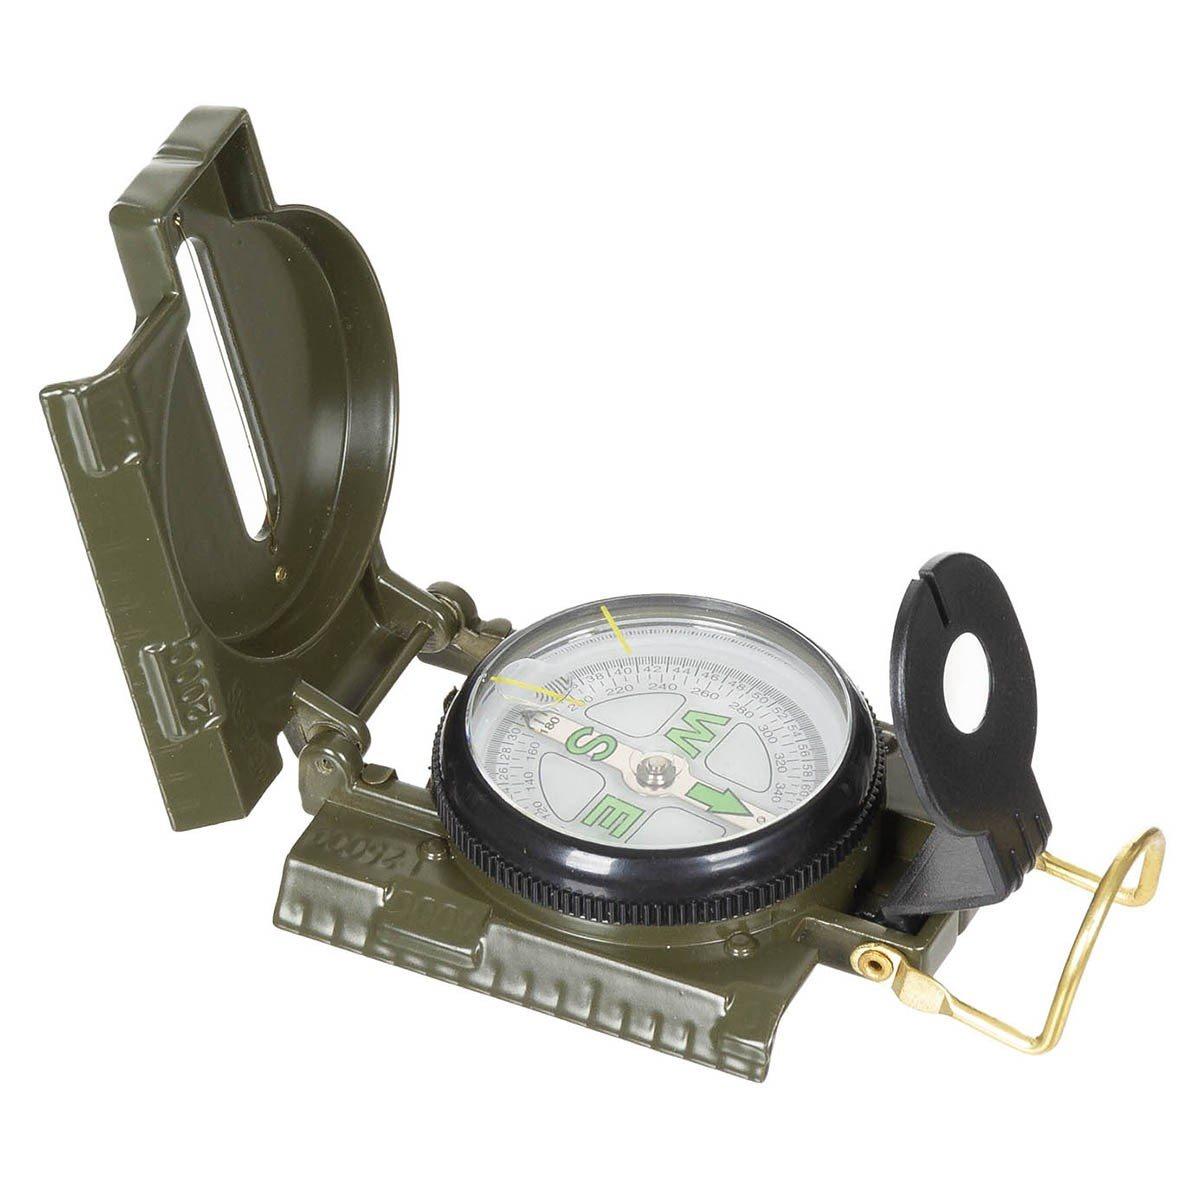 Kompas US kovový OLIV MFH int. comp. 34023 L-11